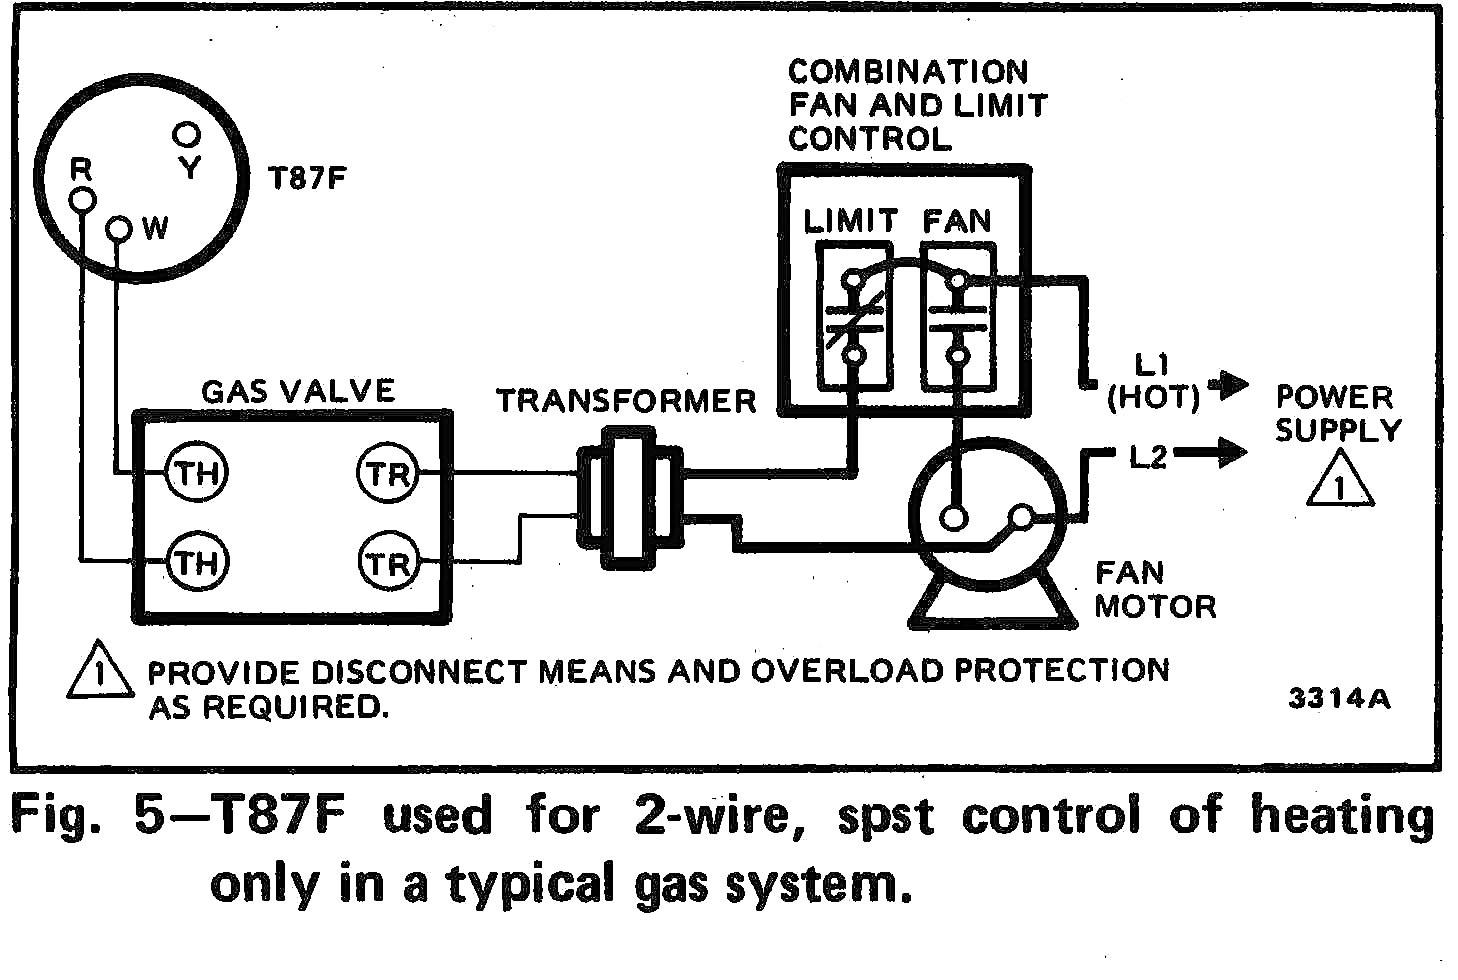 Electric Furnace Fan Relay Wiring Diagram New Gas Furnace Wiring Diagram Delux Design Older Label Pleasing